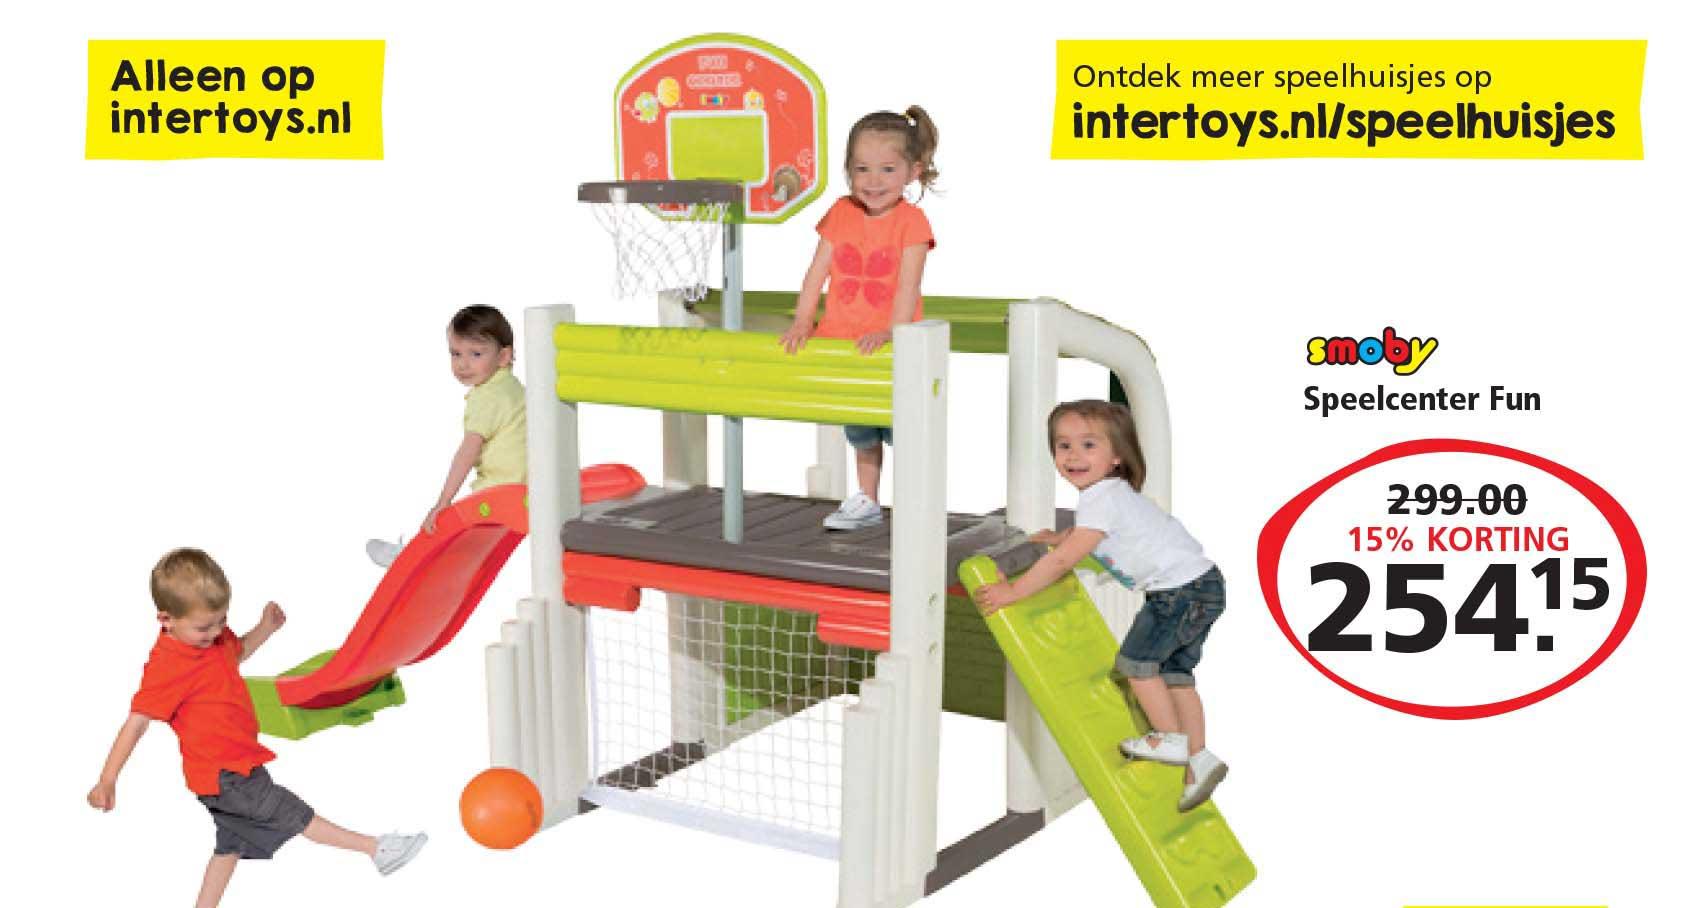 Intertoys Smoby Speelcenter Fun: 15% Korting